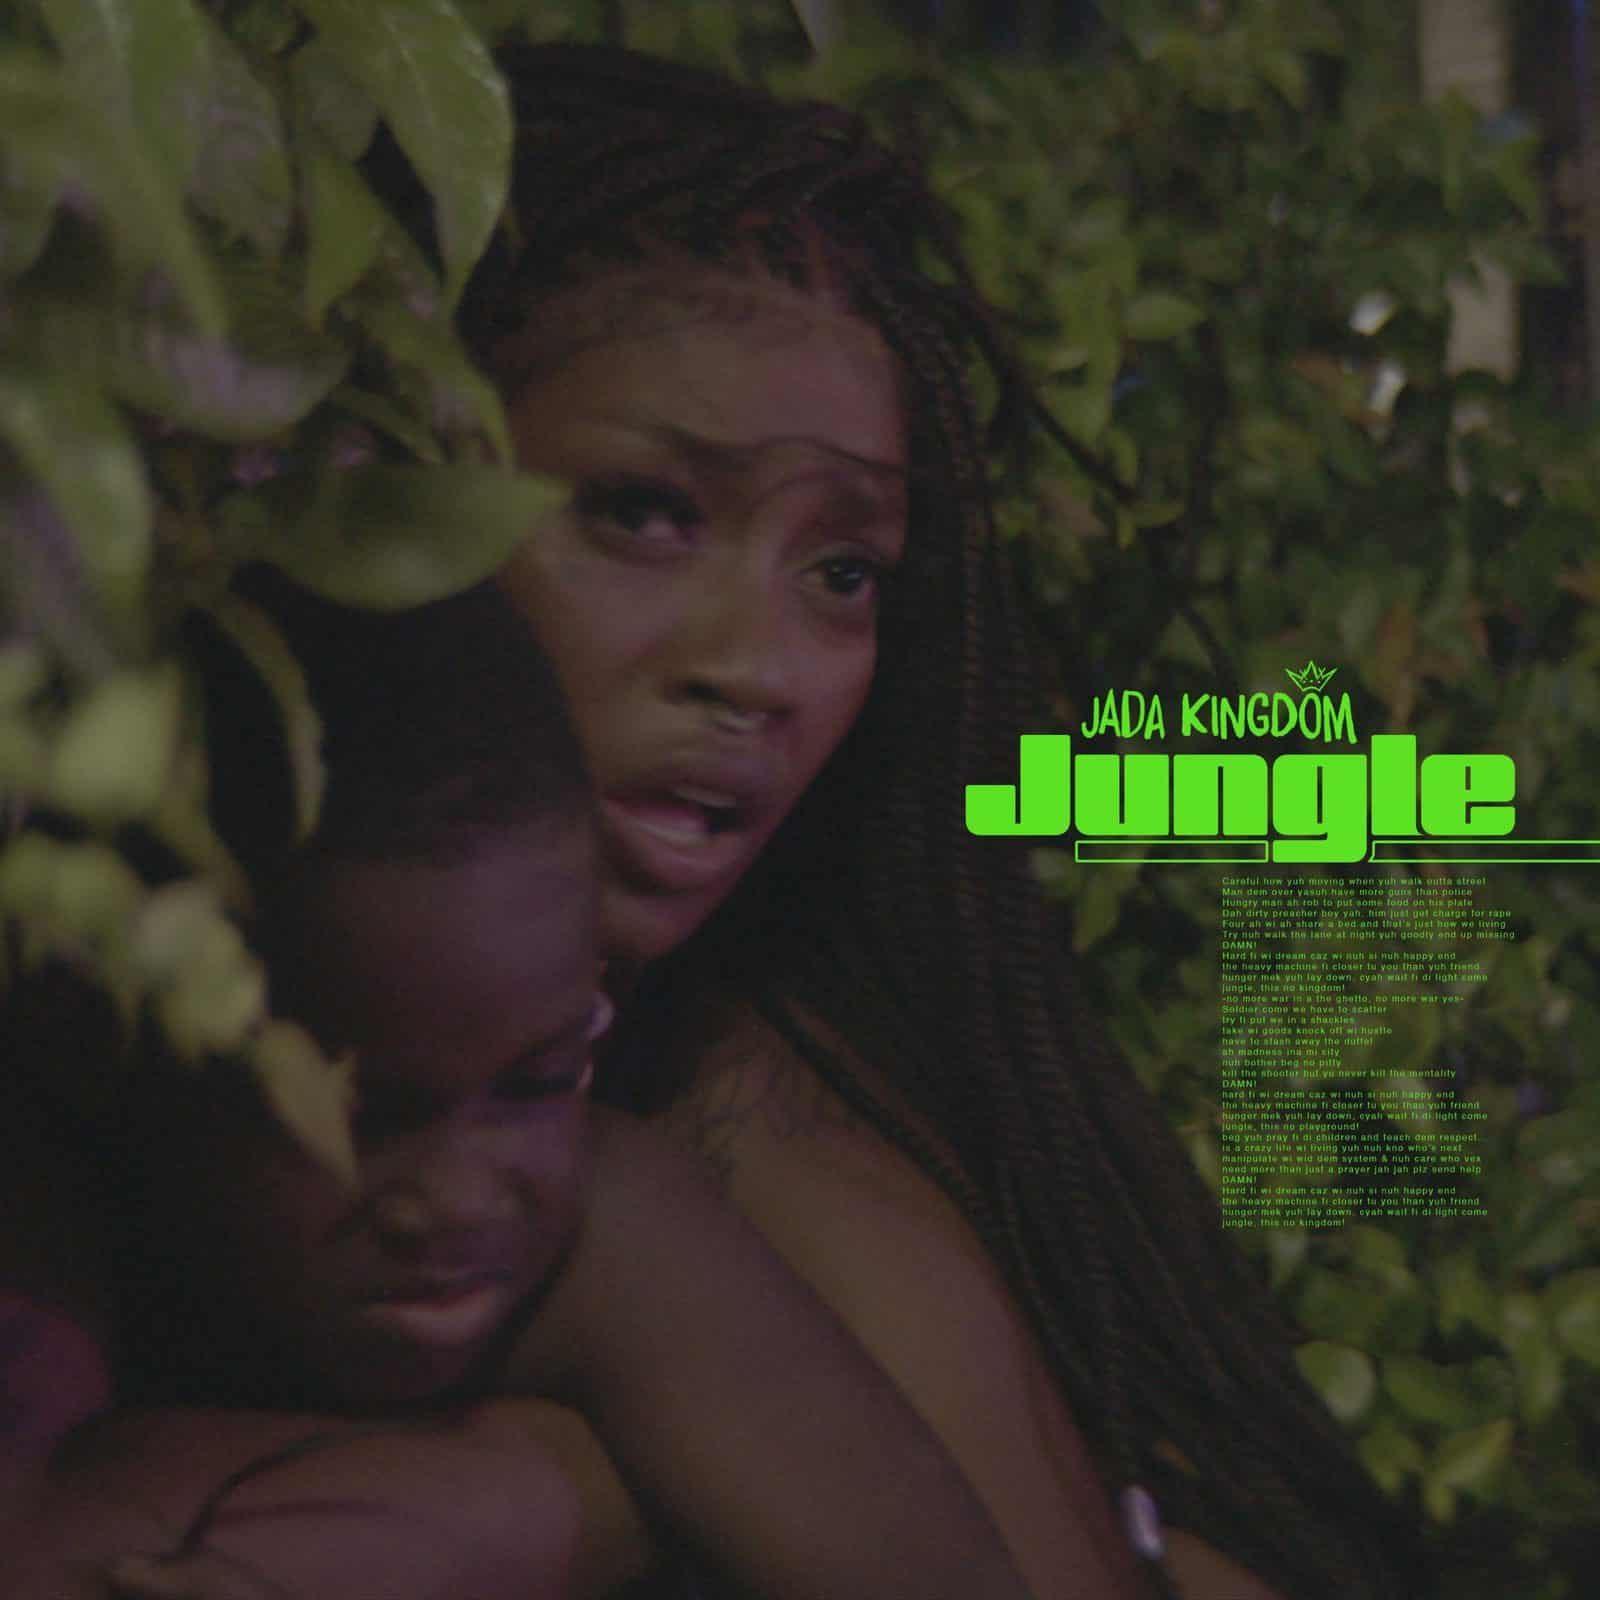 Jada Kingdom - Jungle - Money Well Spent / Republic Records